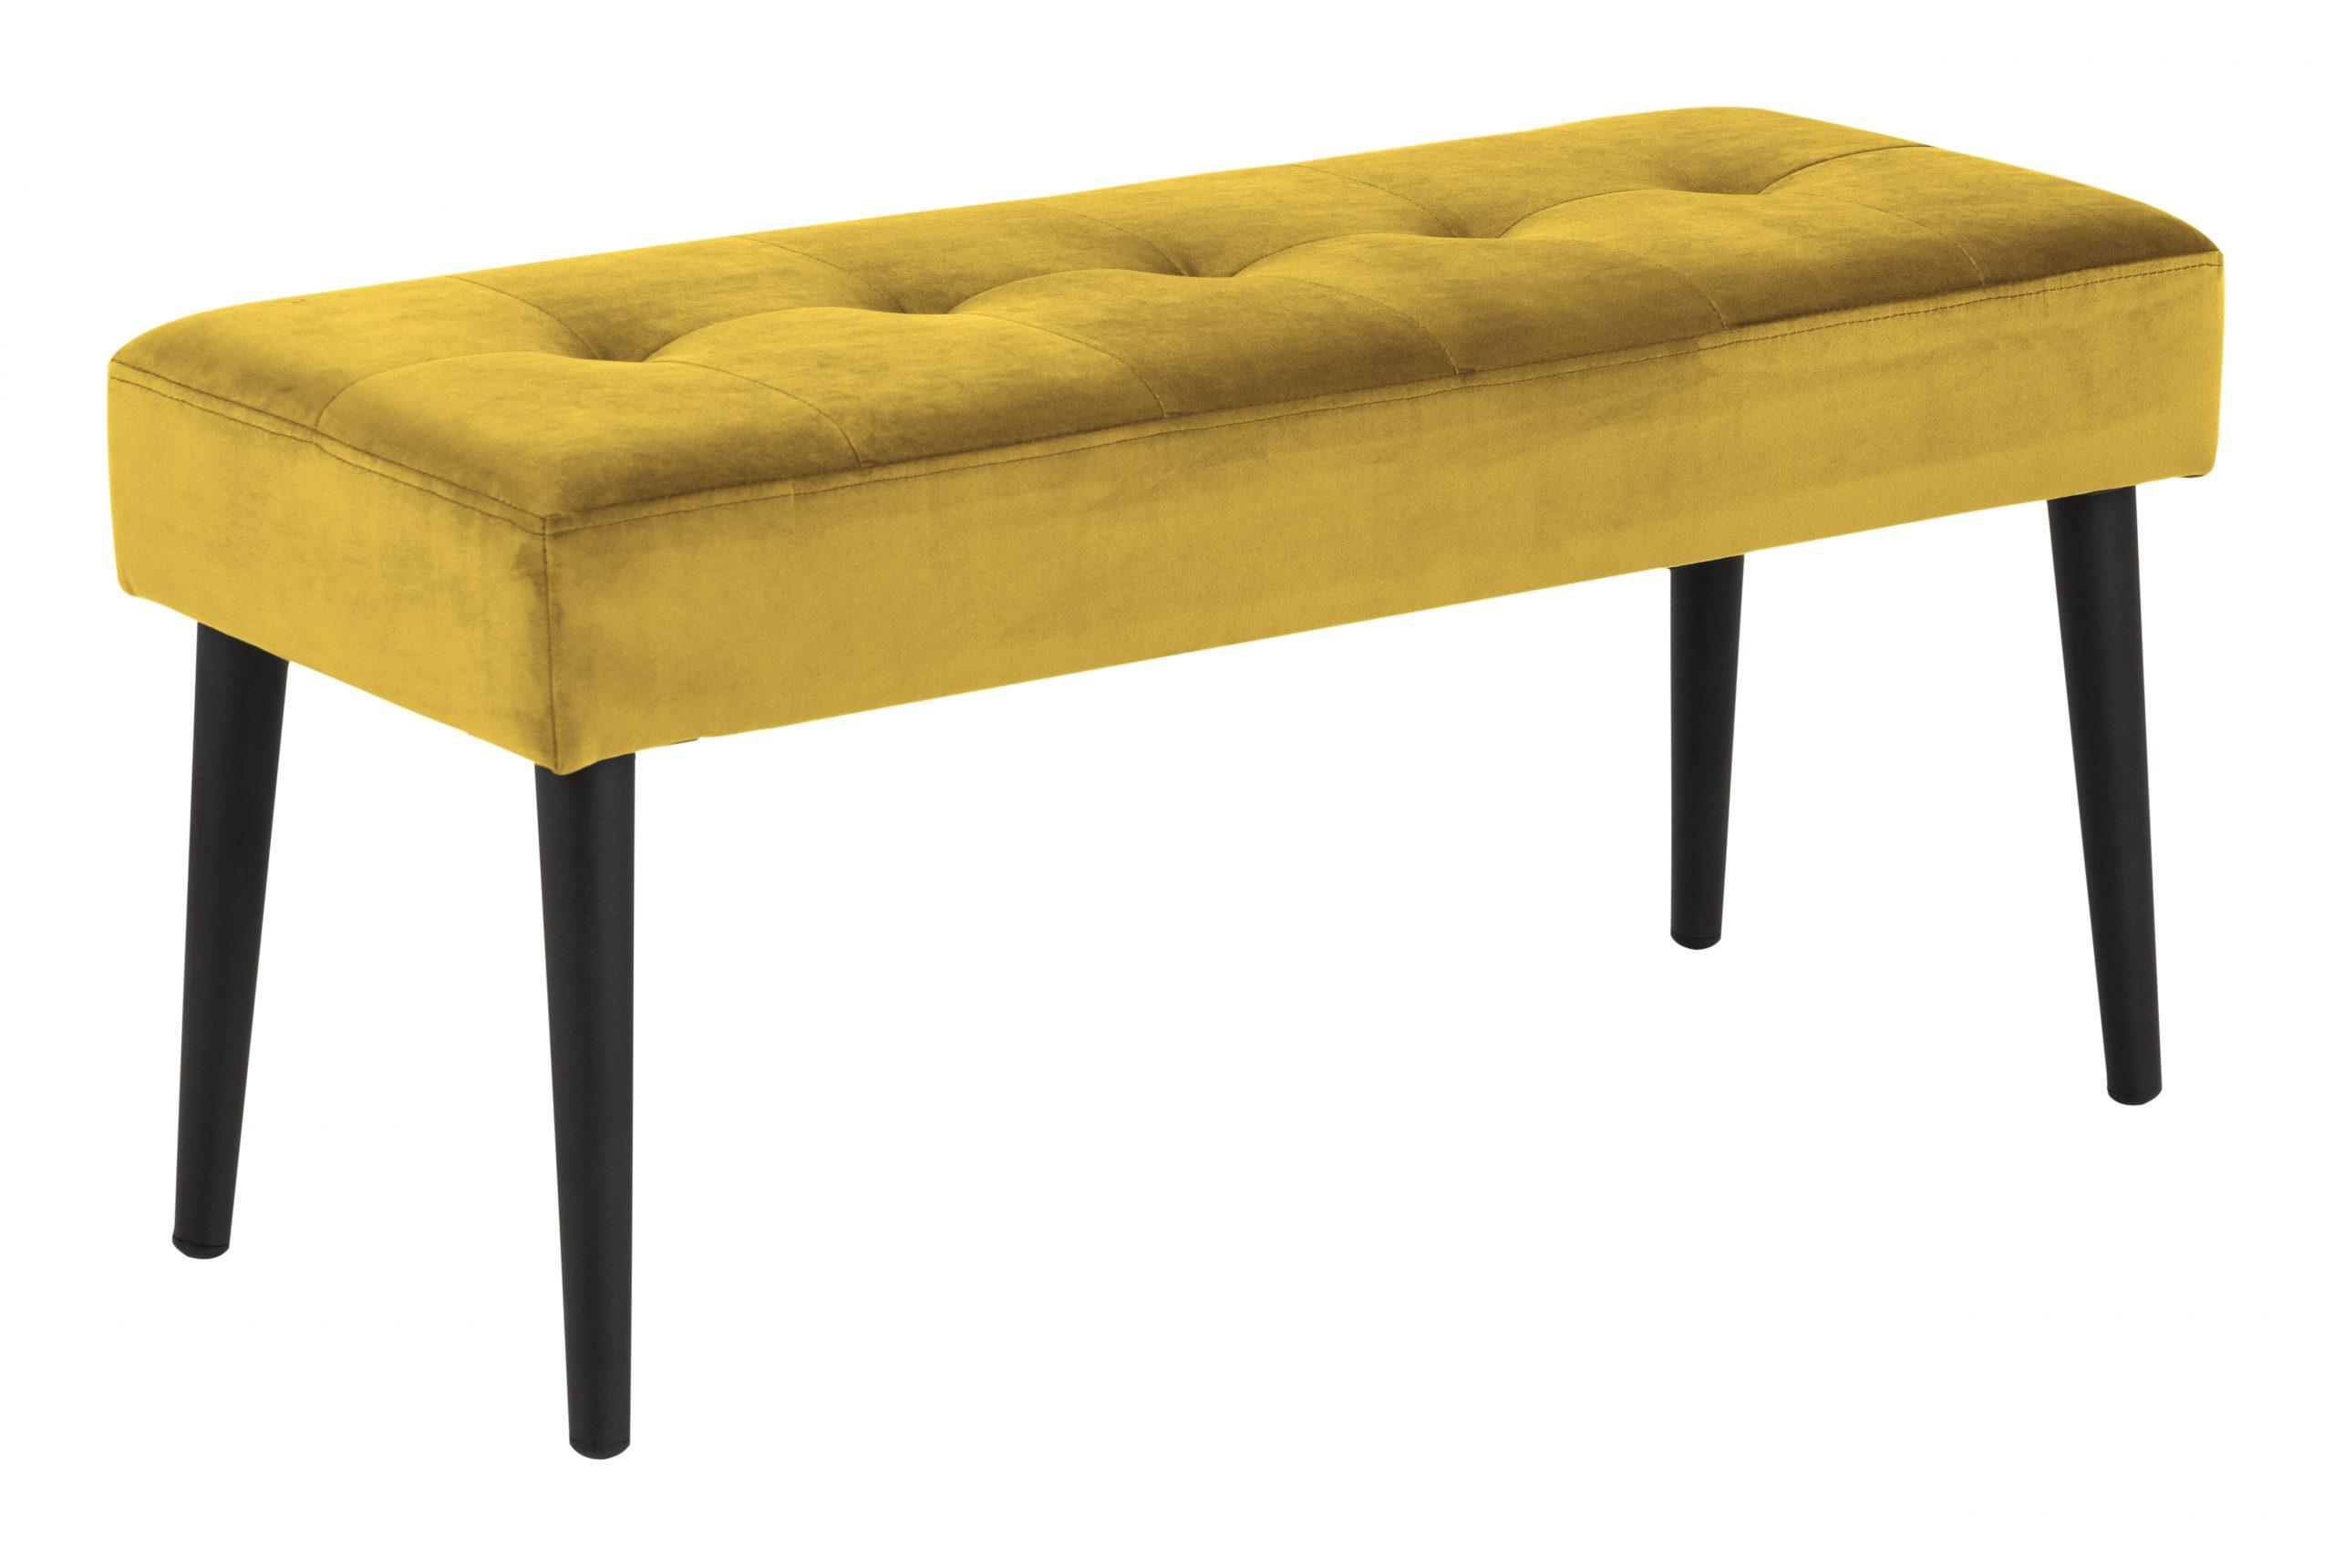 Bendt Halbankje 'Kiara' Velvet, kleur Yellow | Bendt